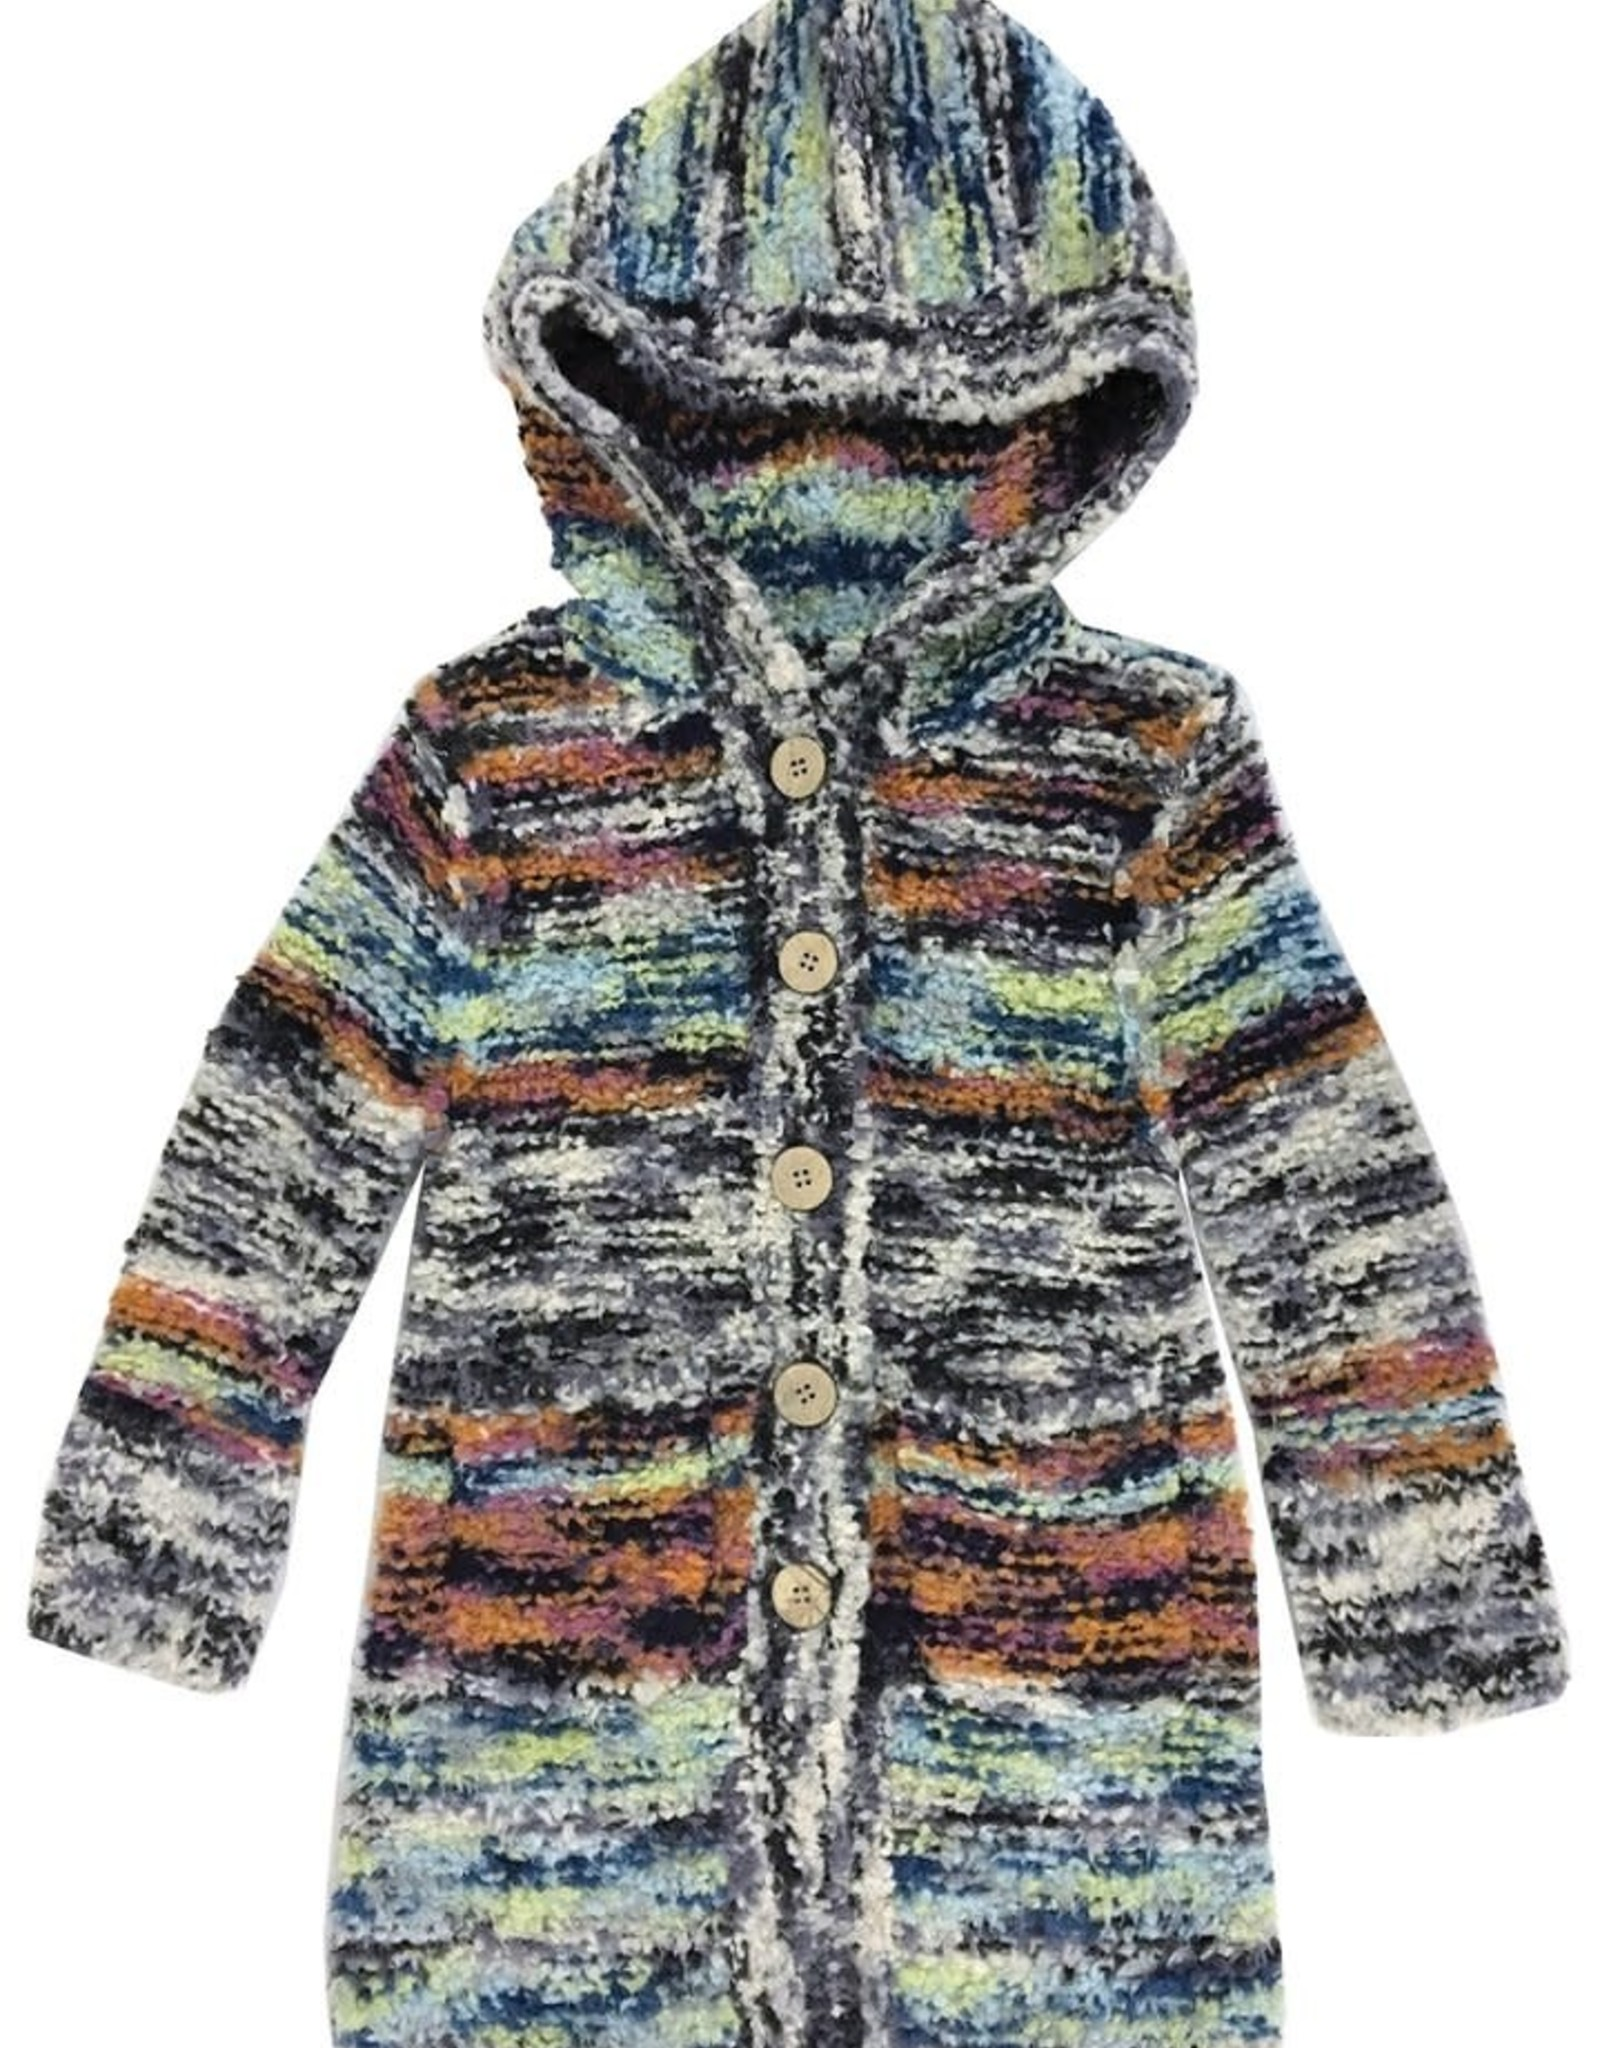 Mimi & Maggie Rocky Mountain Cuddly Sweater